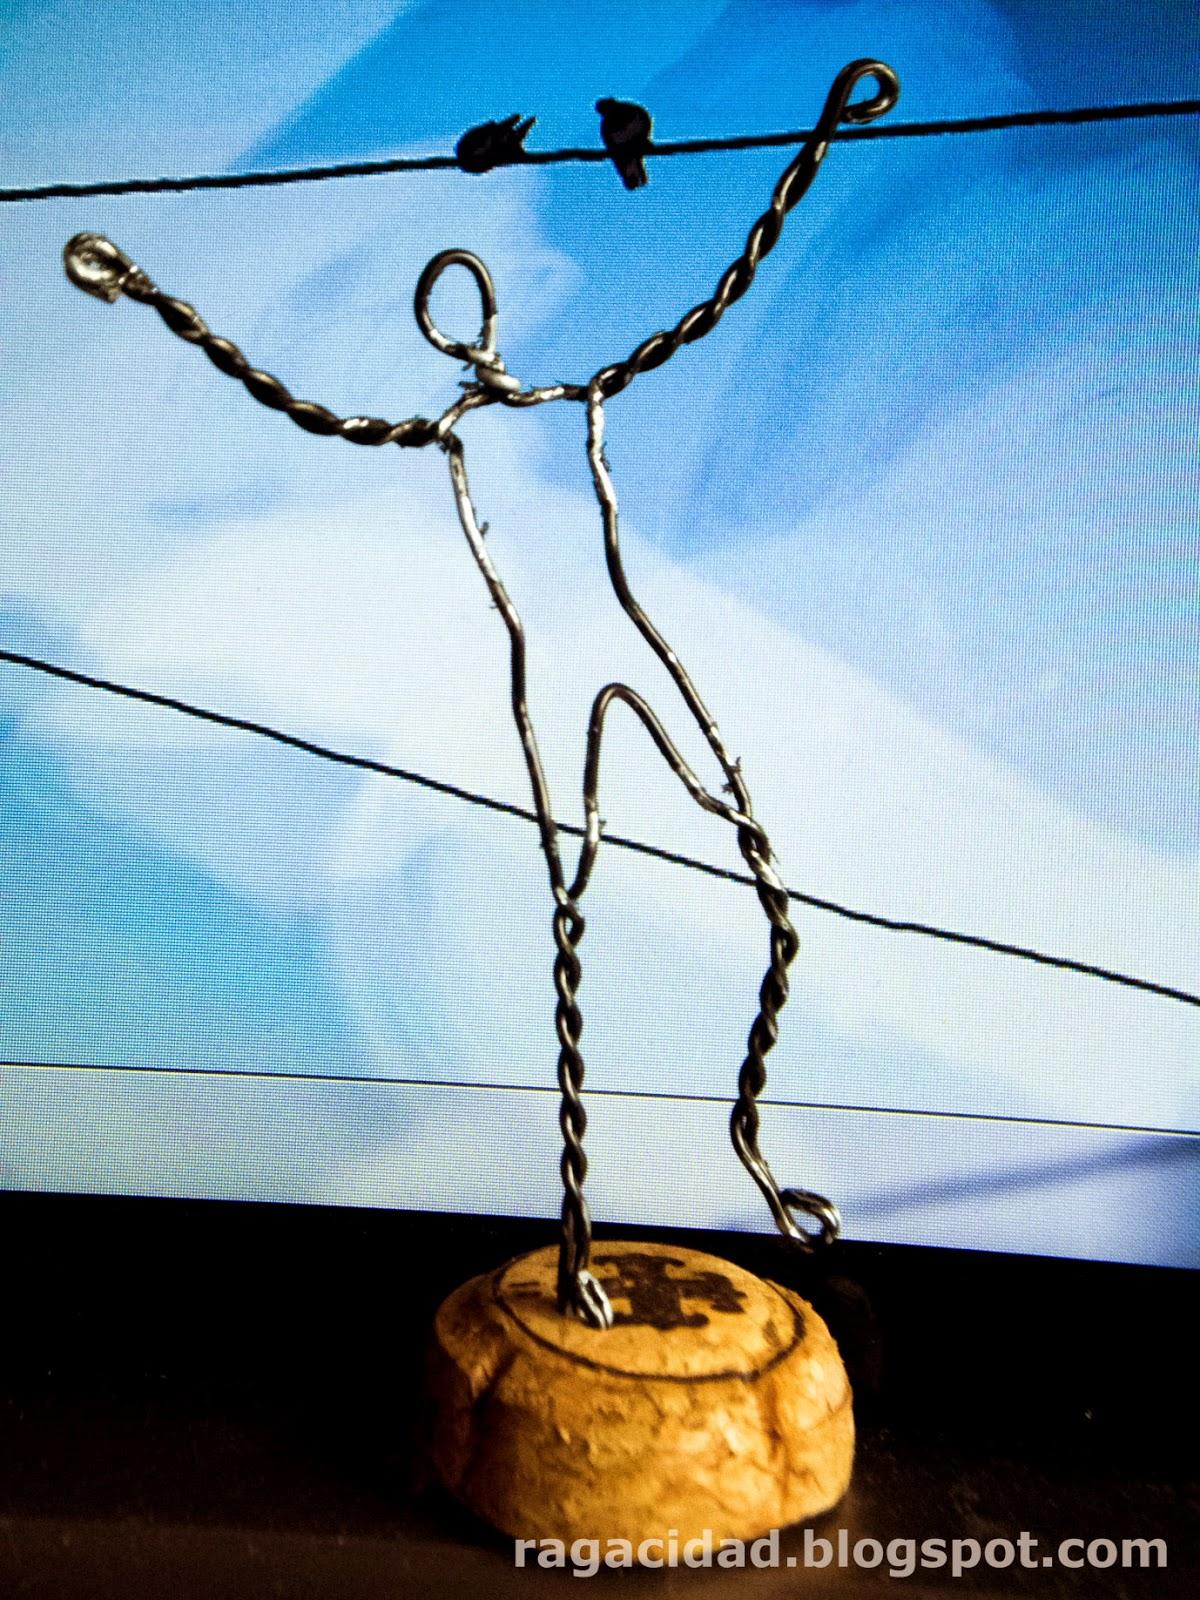 ragacidad peque as esculturas On esculturas pequenas